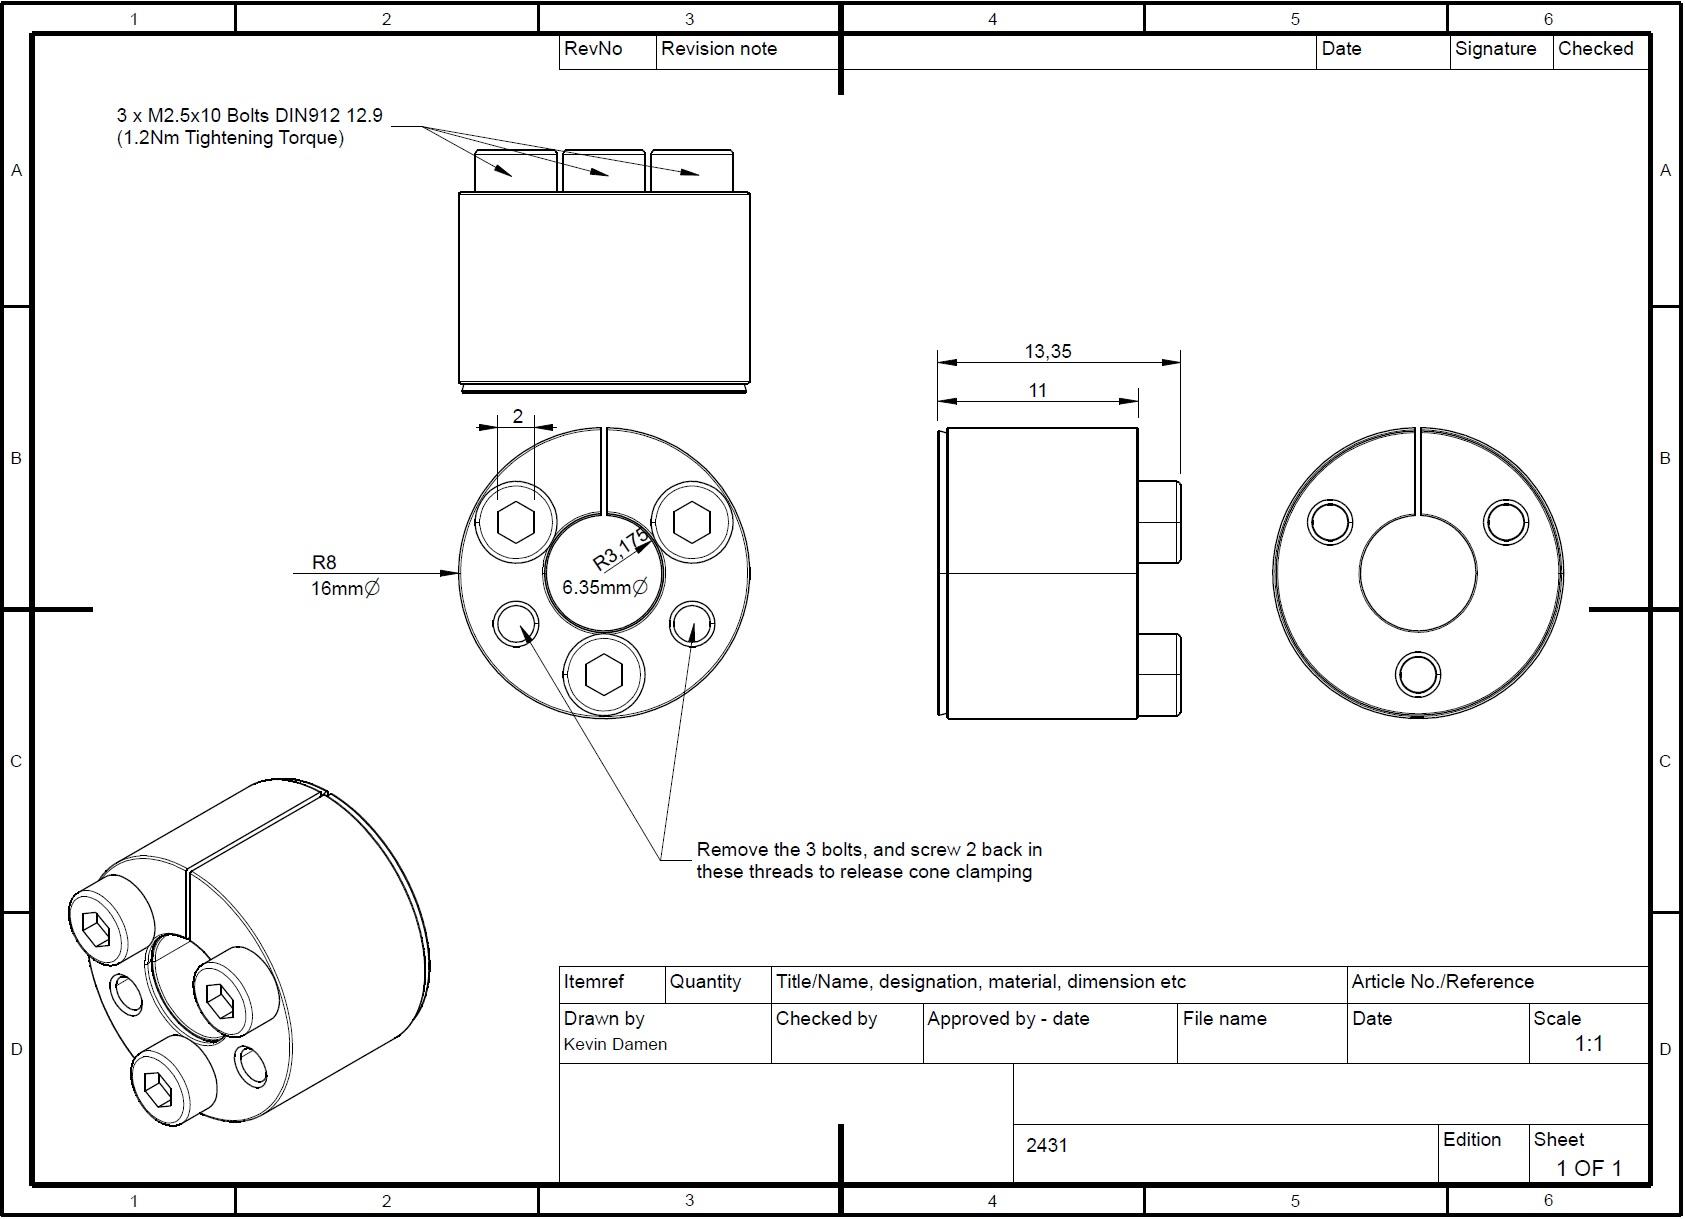 24312 bk61 locking assemblies bk61 d x d x 635x16 detail dimensions